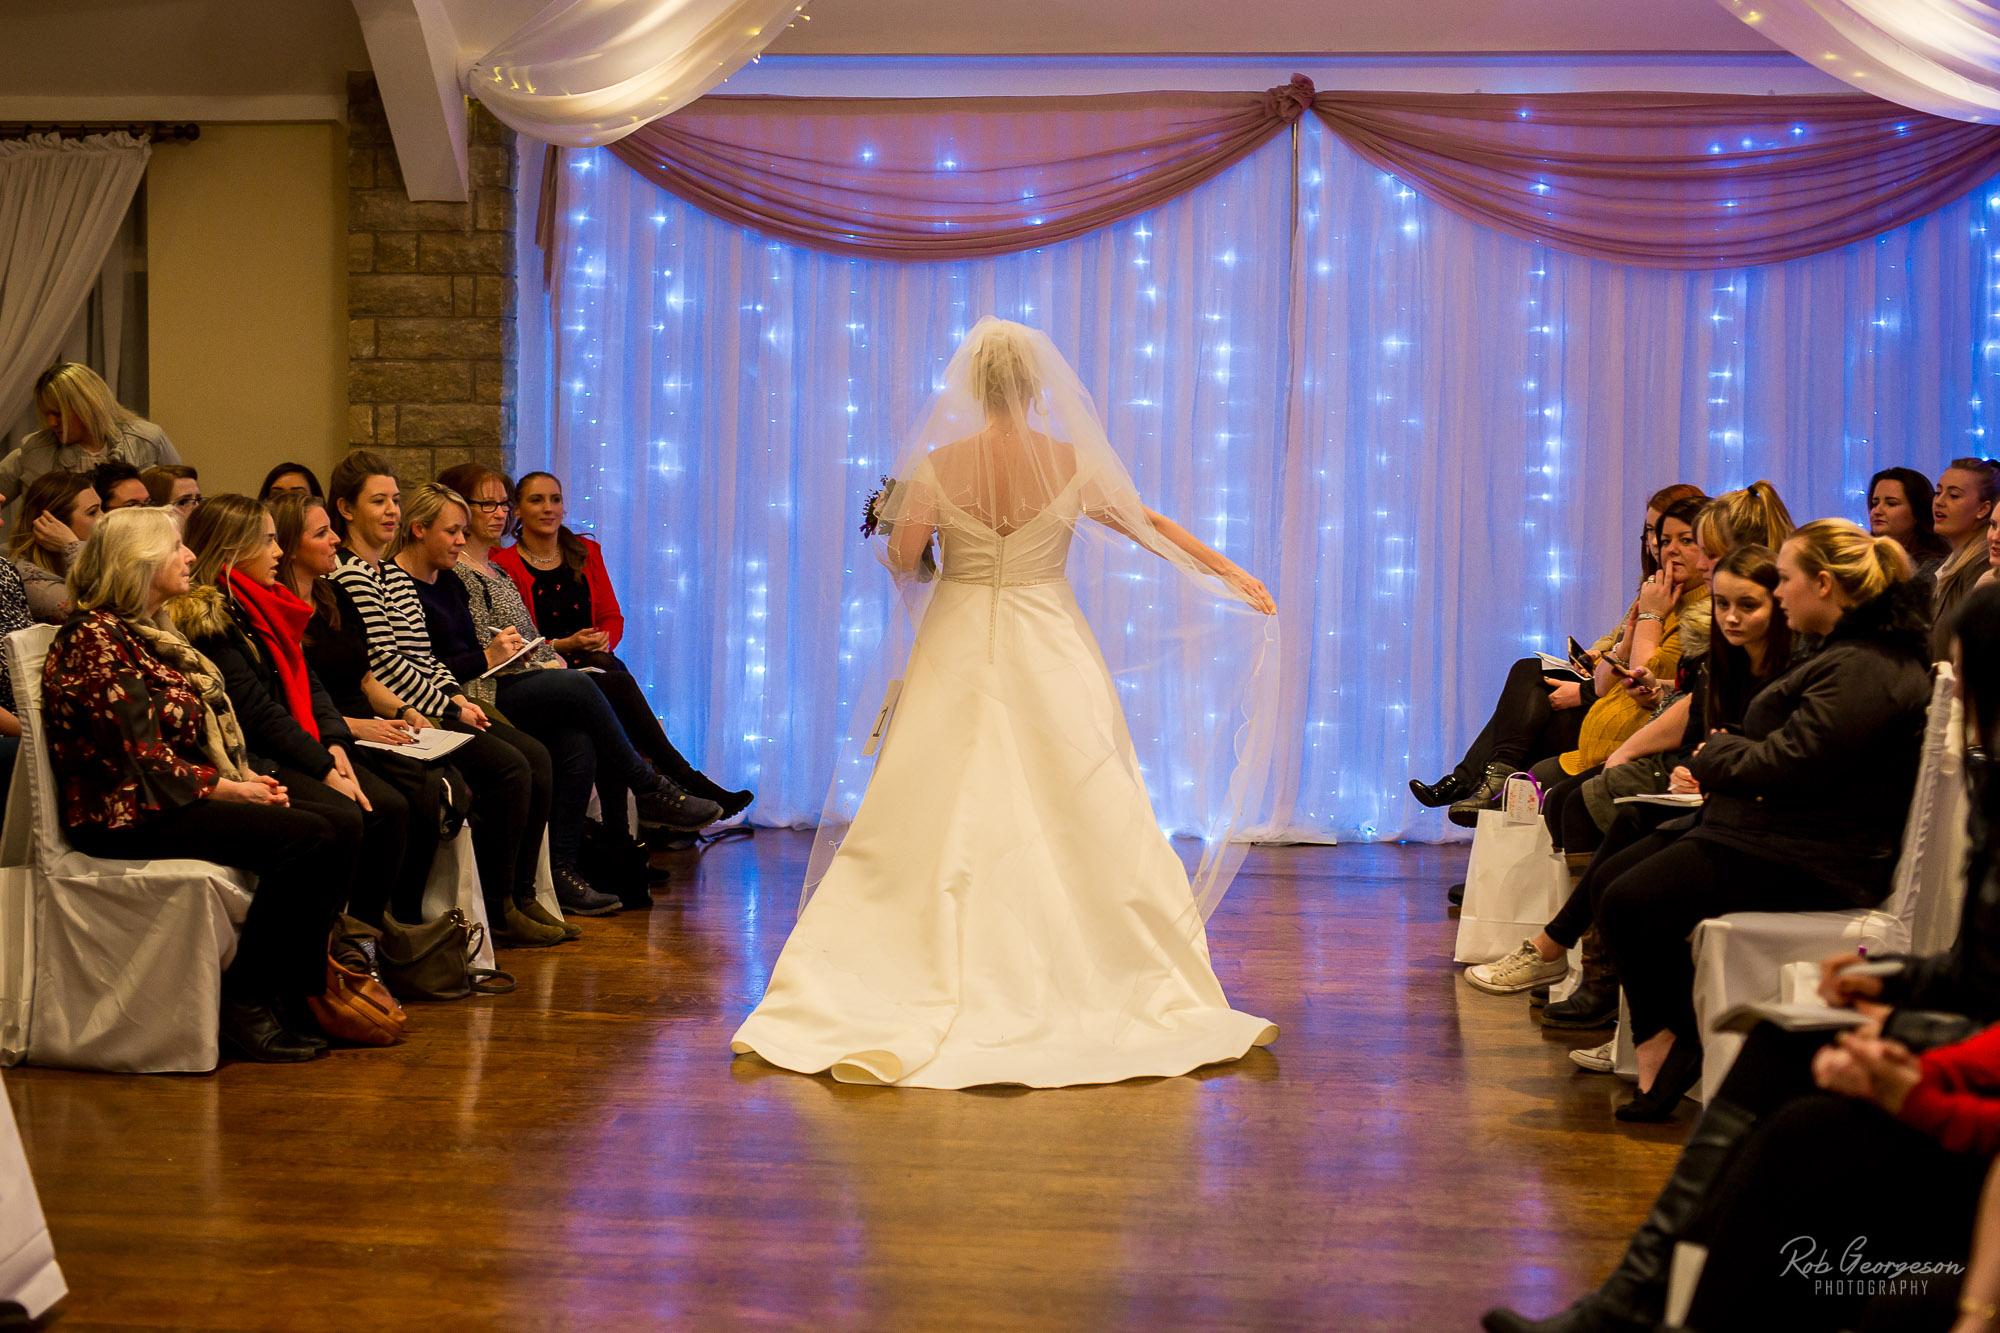 Amelia's Bridal Wedding Dress